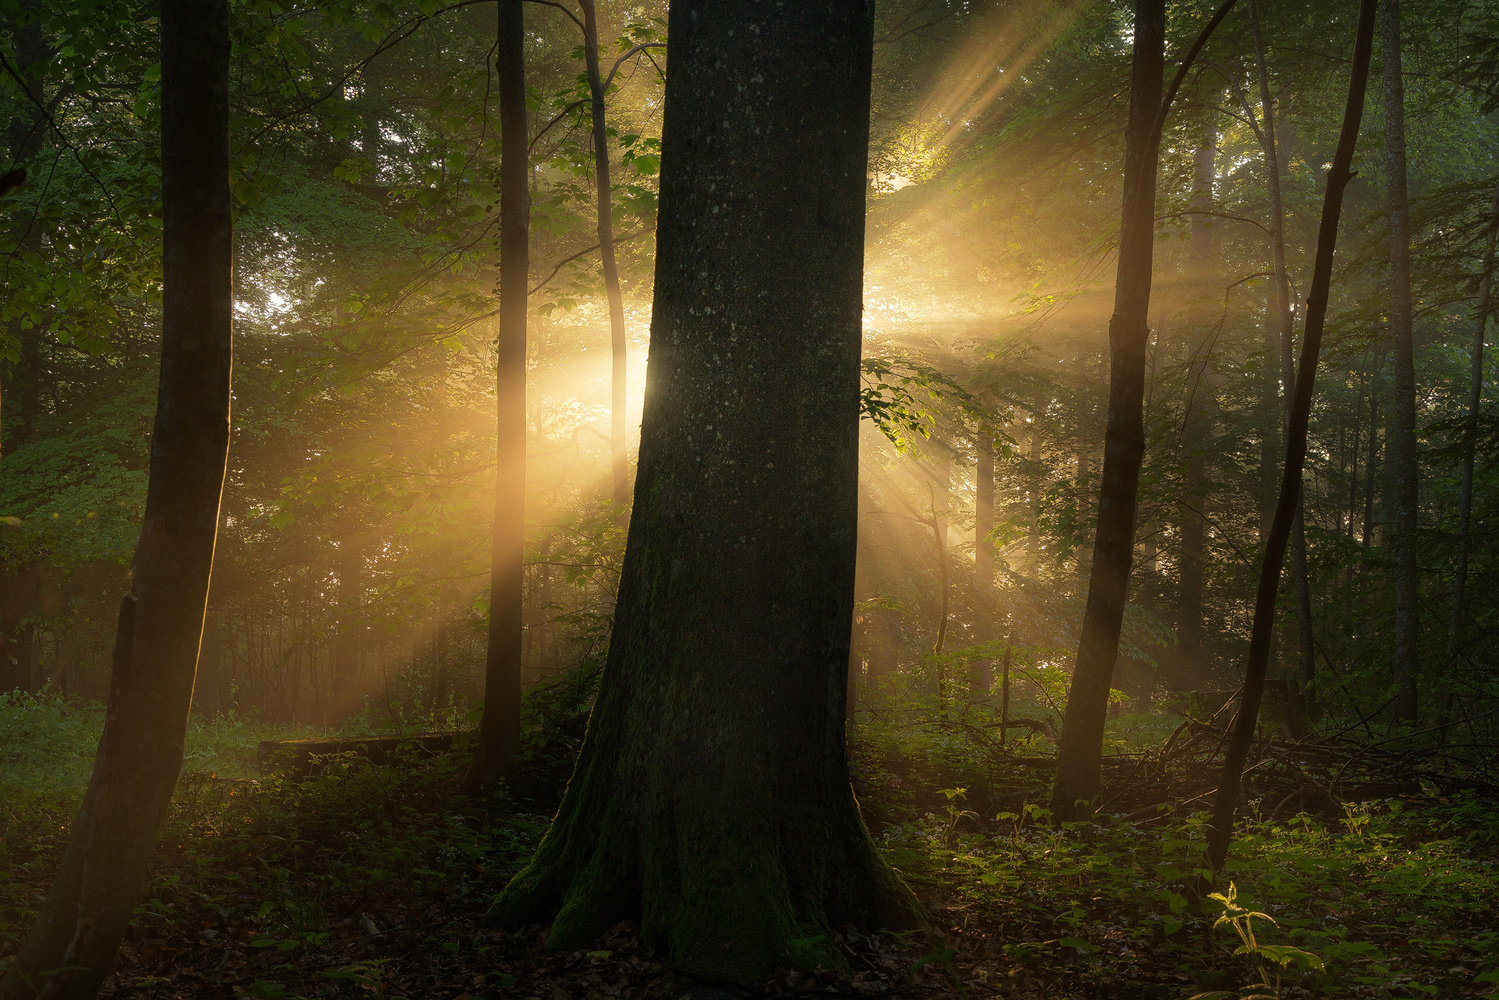 Burst of Light by Christian Möhrle